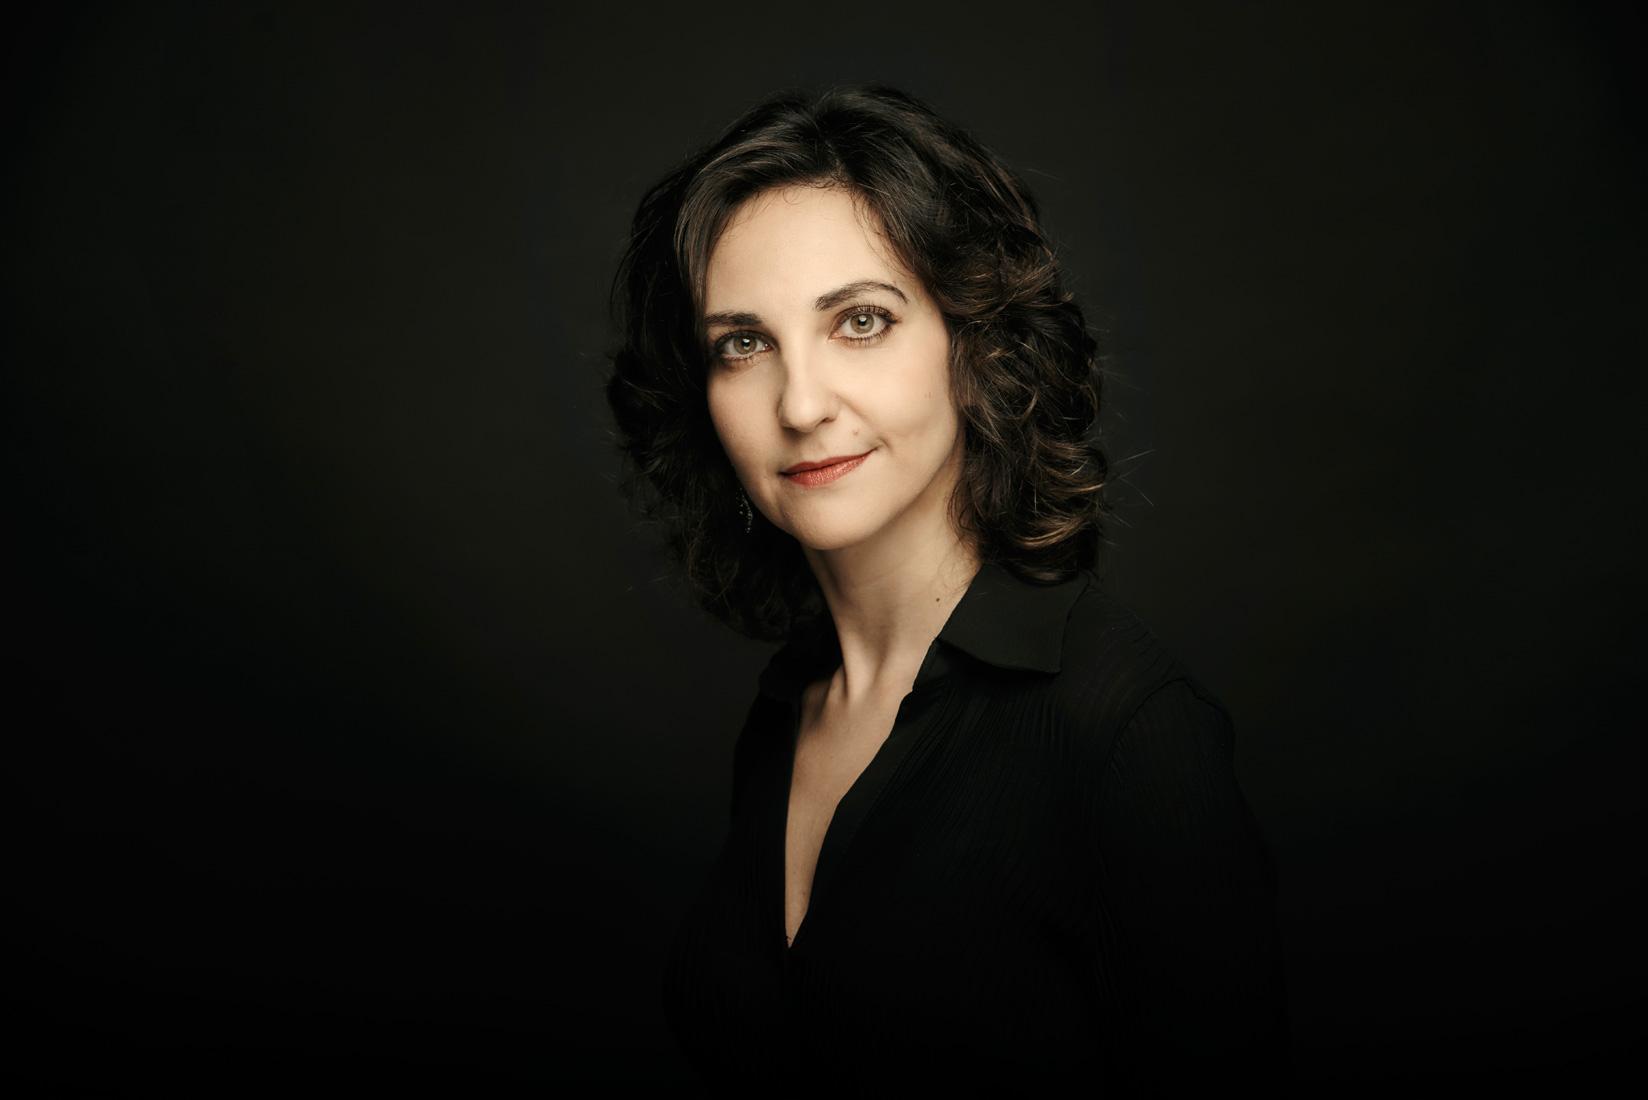 Yana Tsanova